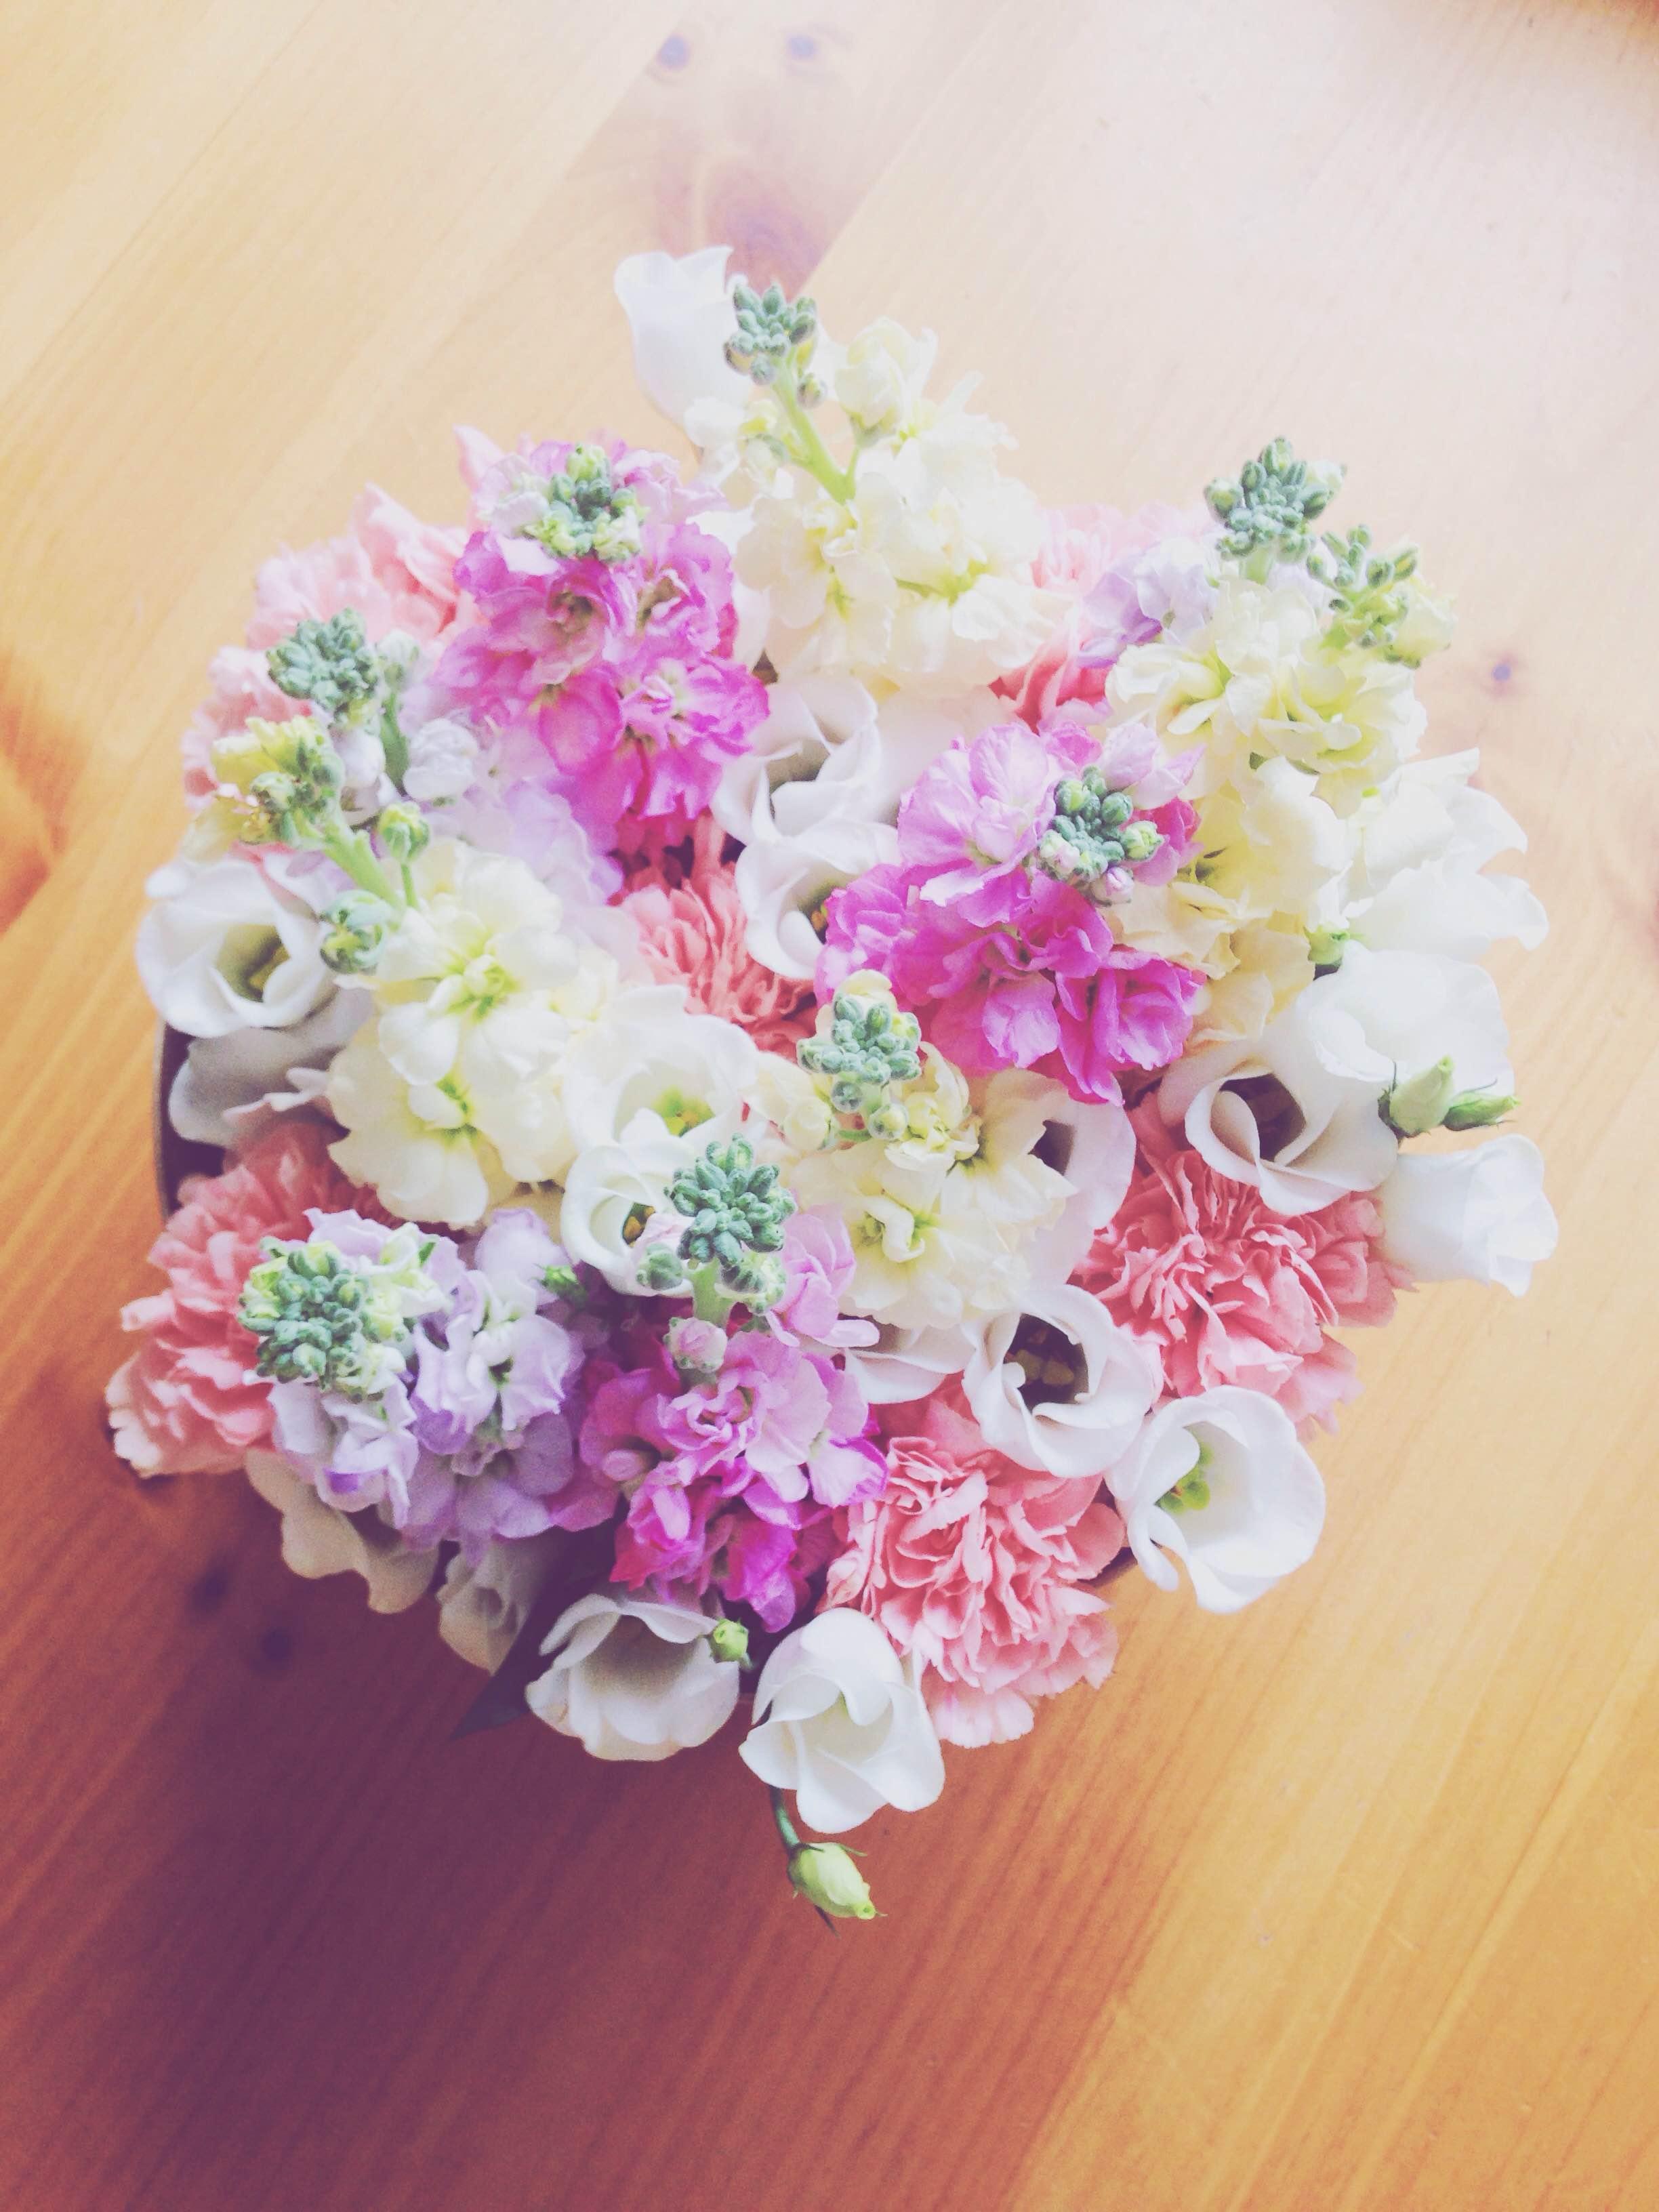 A flower arrangement I made for my Mum's birthday